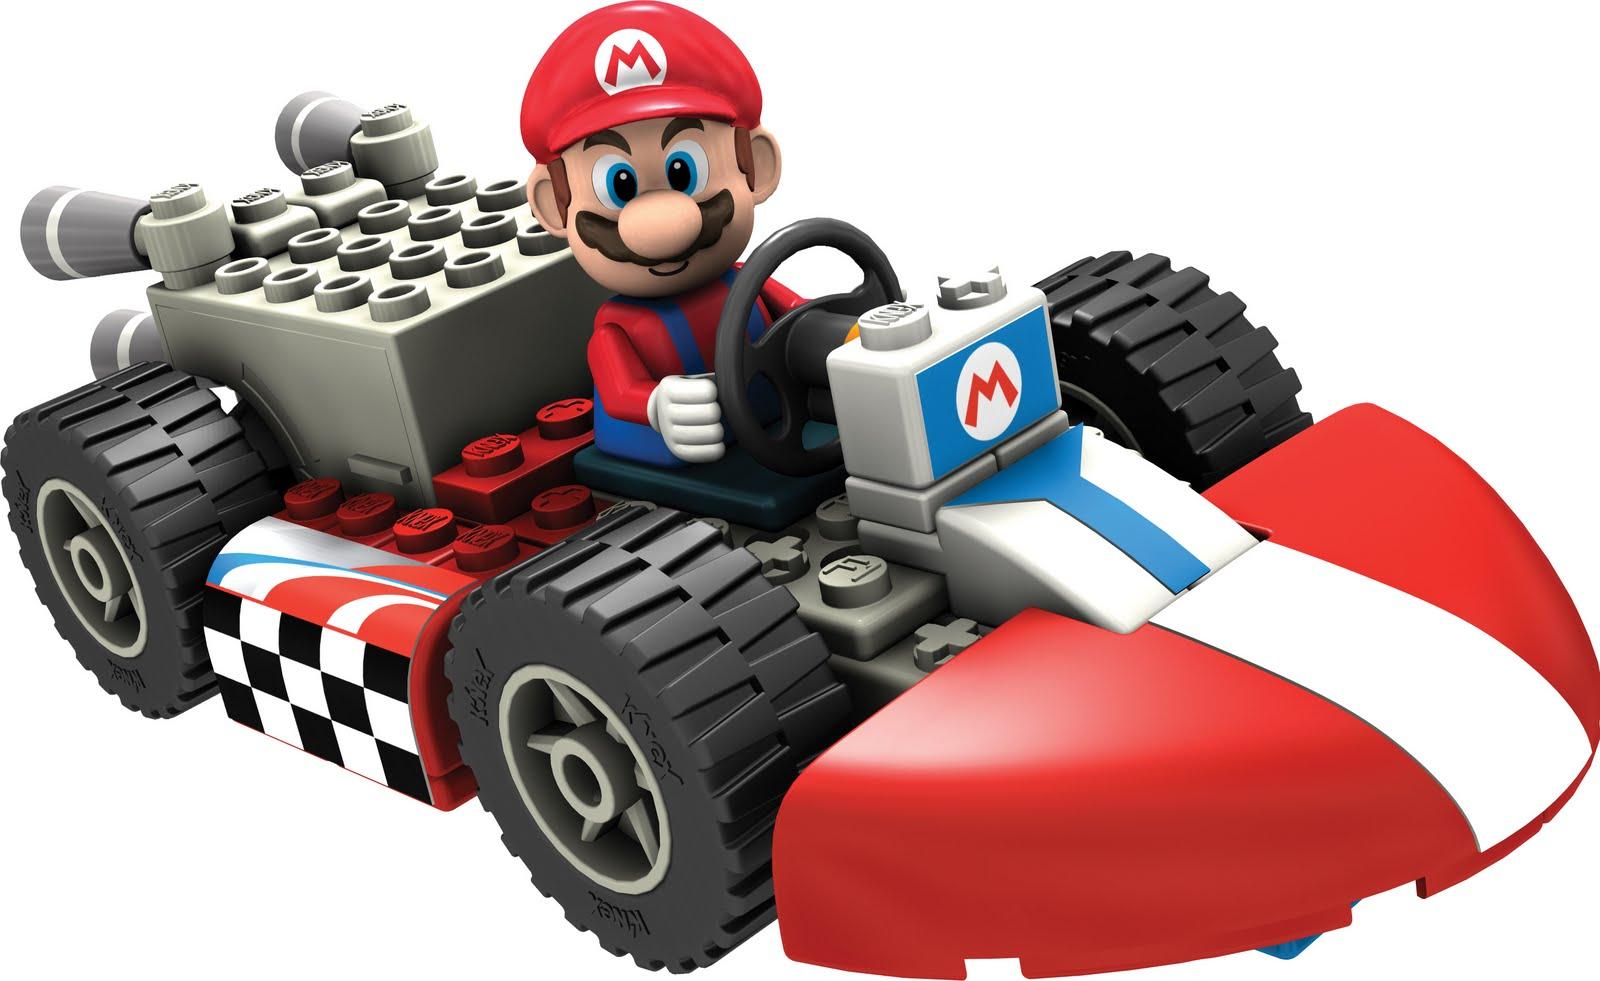 Nintendo Nintendo Announces Life Sized Mario Karts My